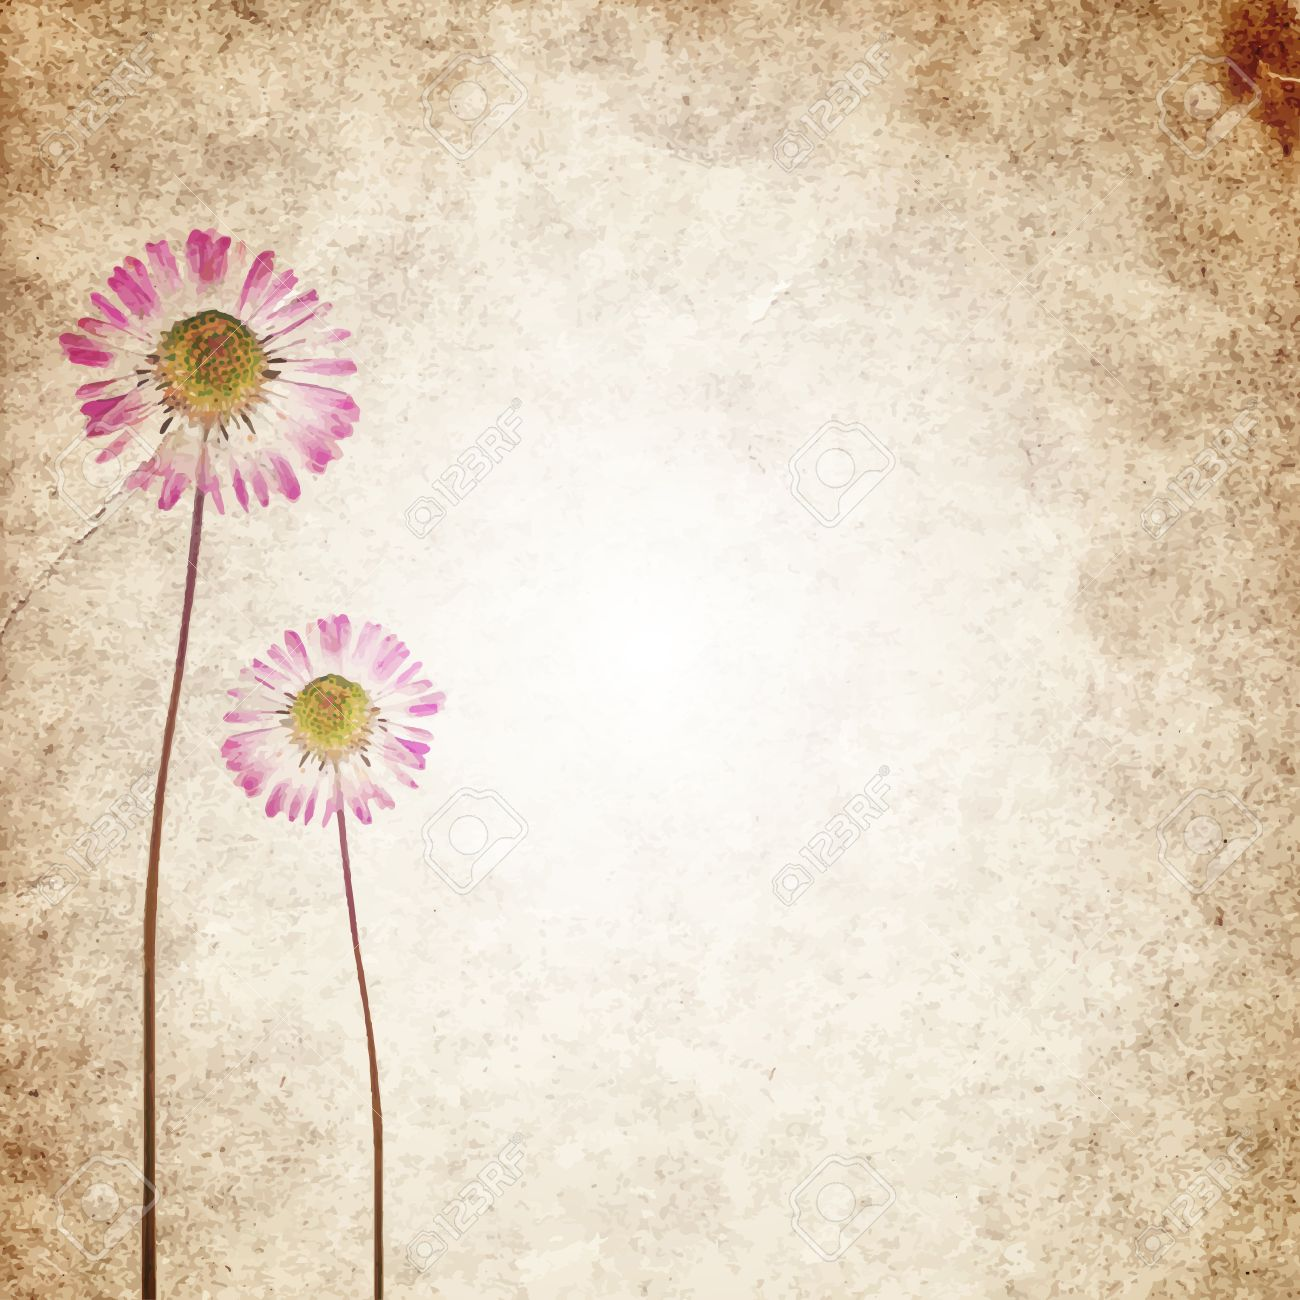 Dried Flower Paper Kubreforic